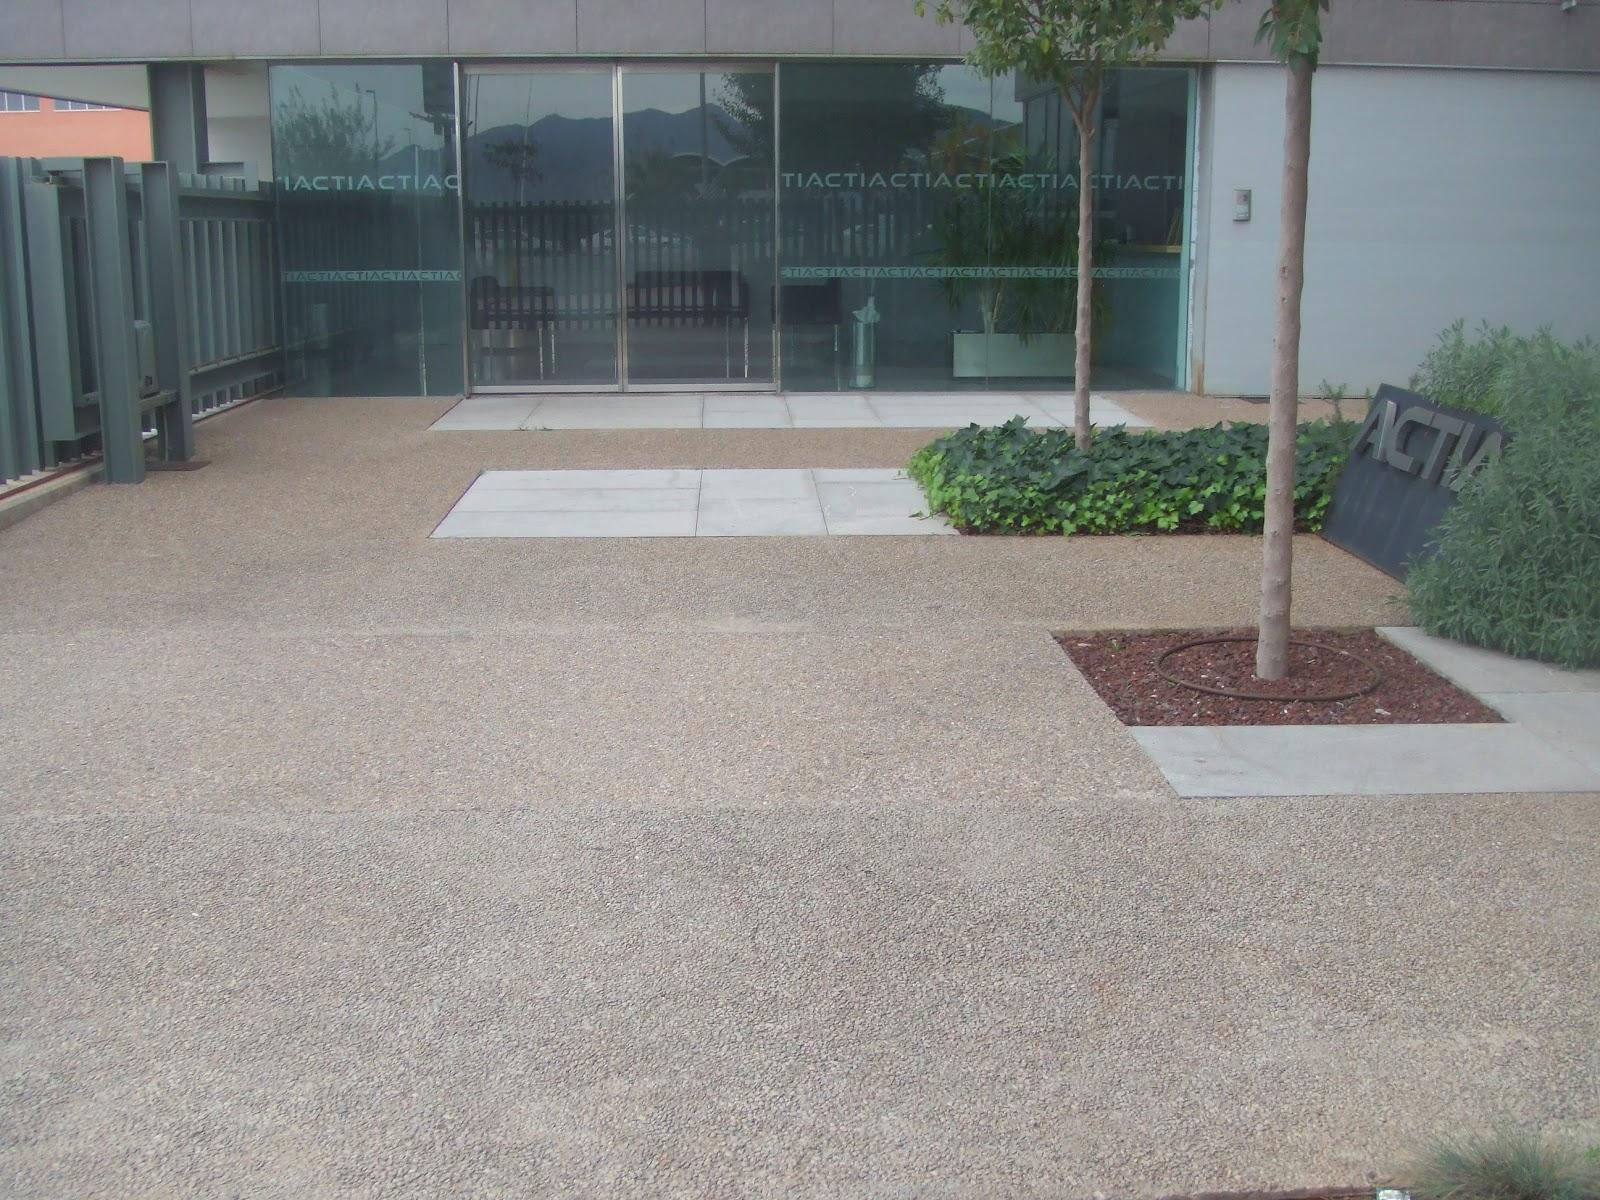 Hormig n desactivado en castell n pavimentos continuos for Hormigon para pavimentos